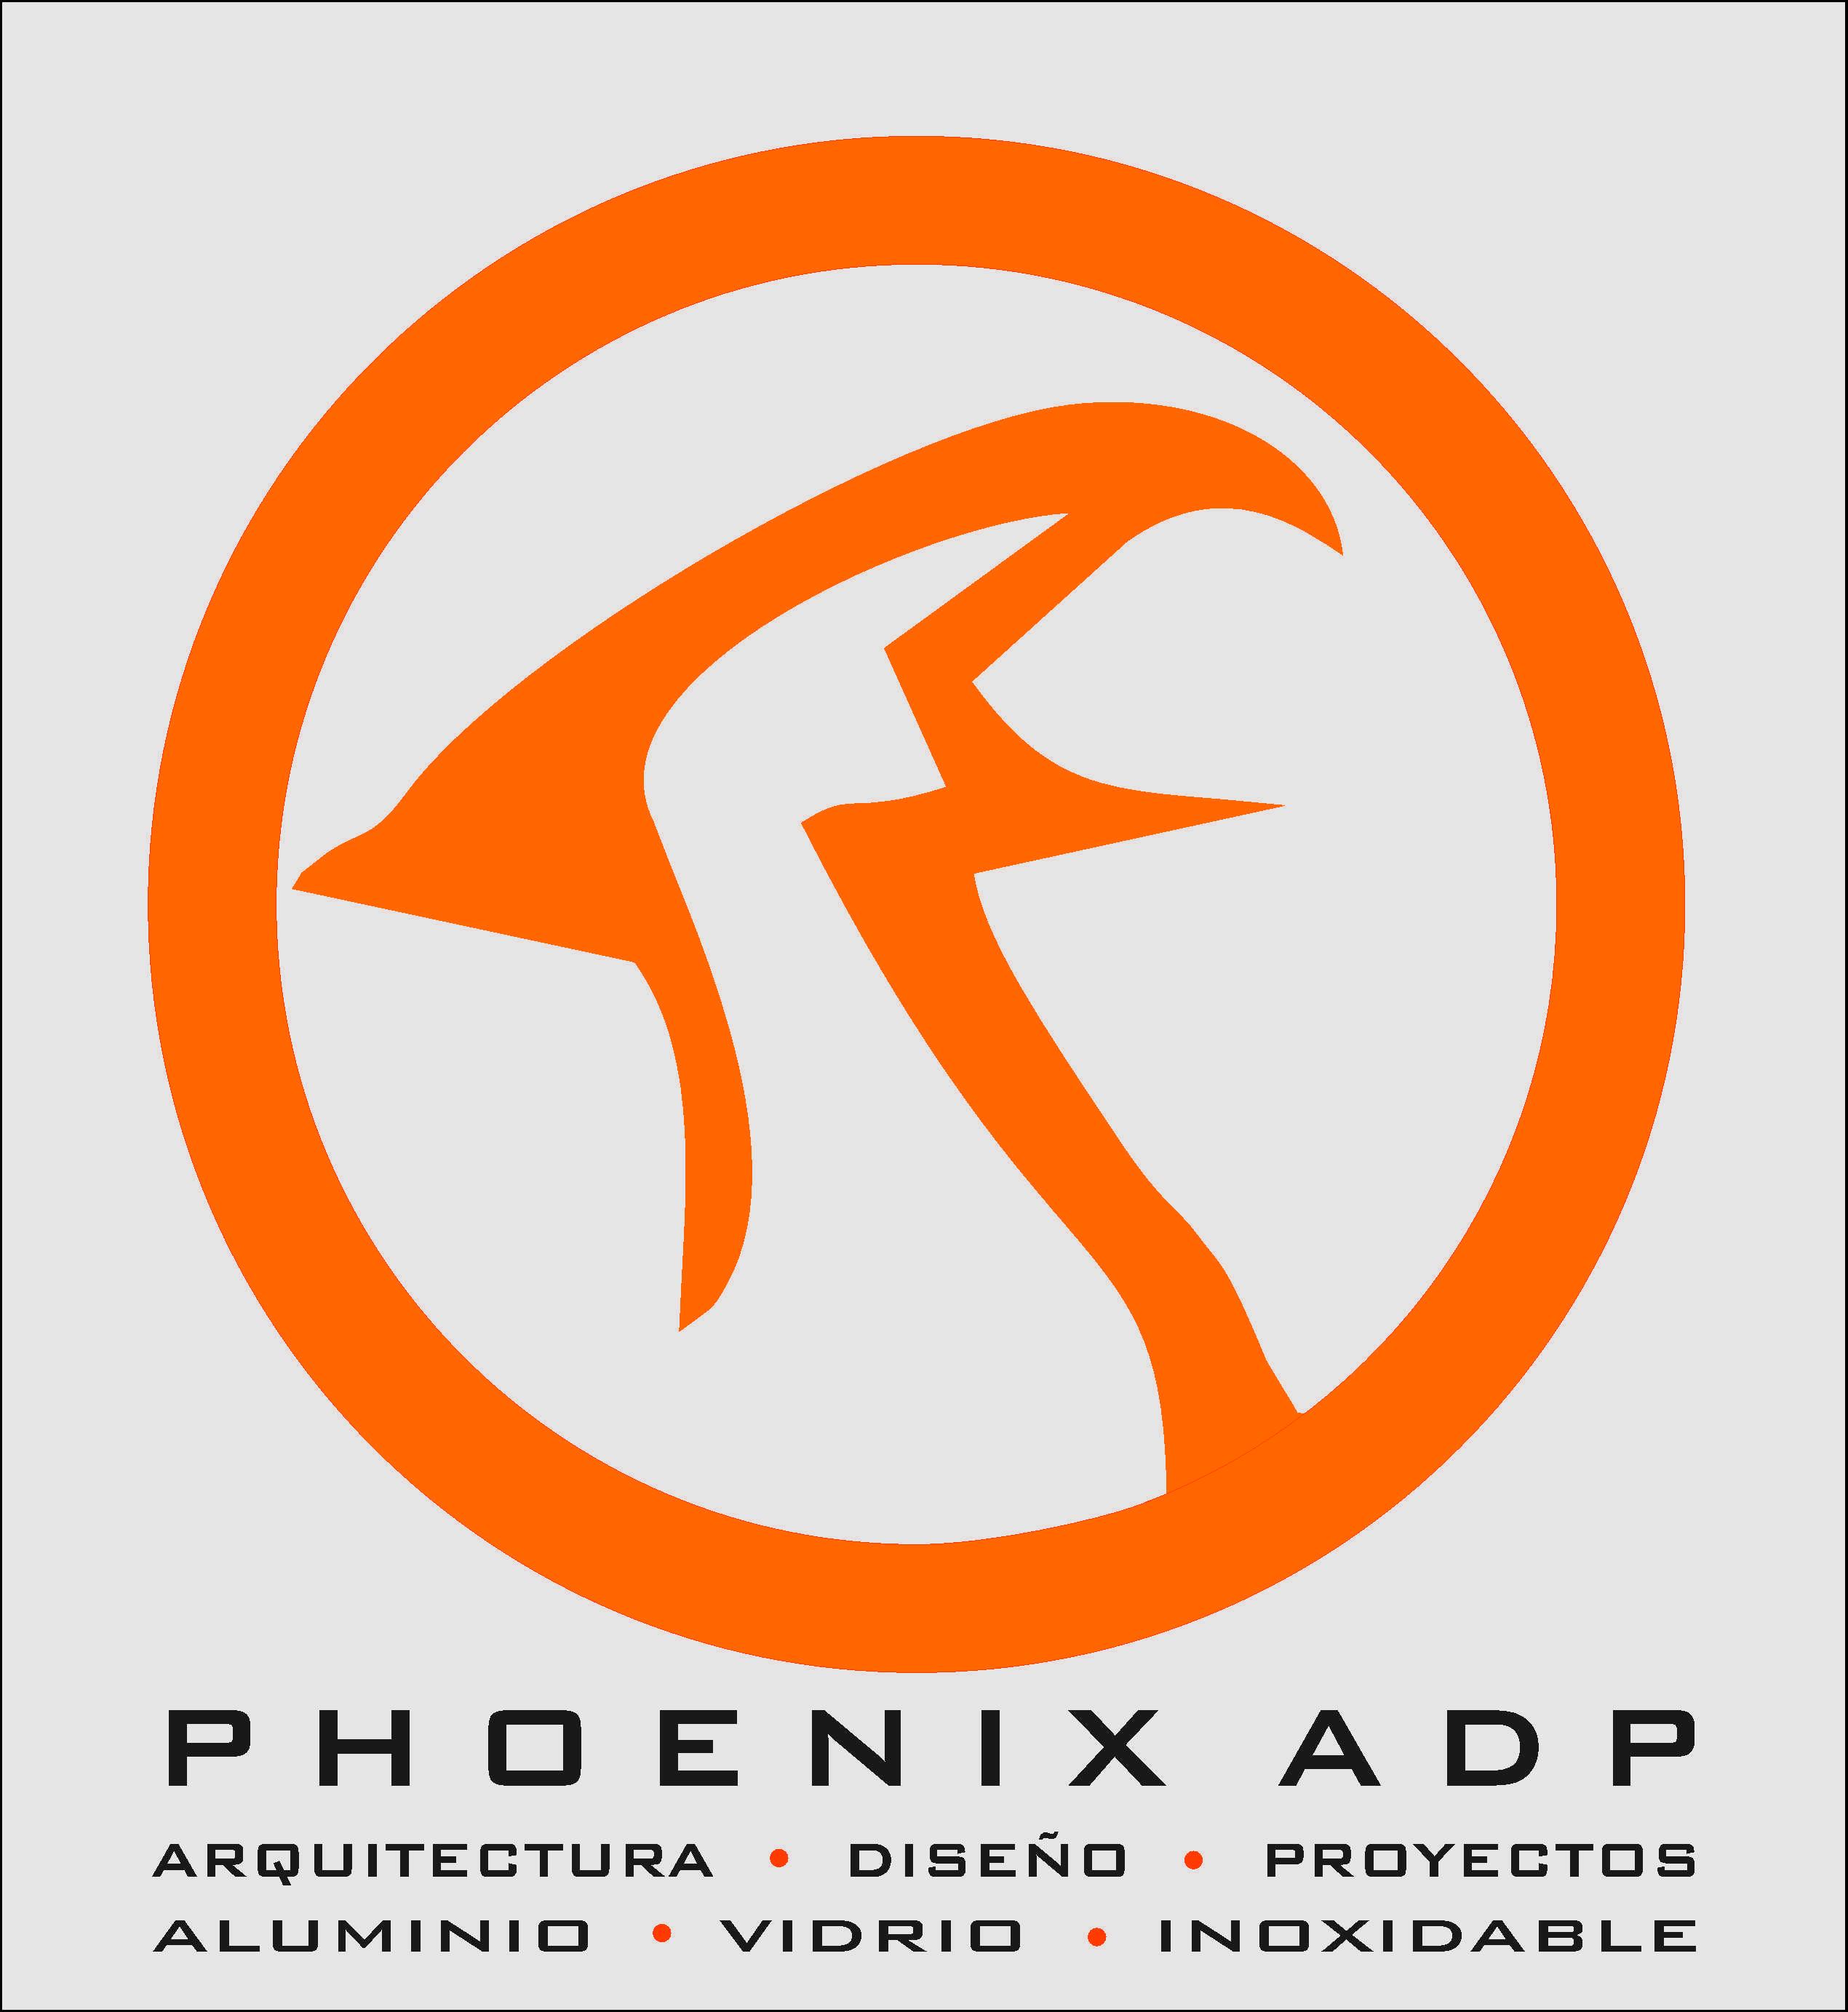 Phoenix Adp